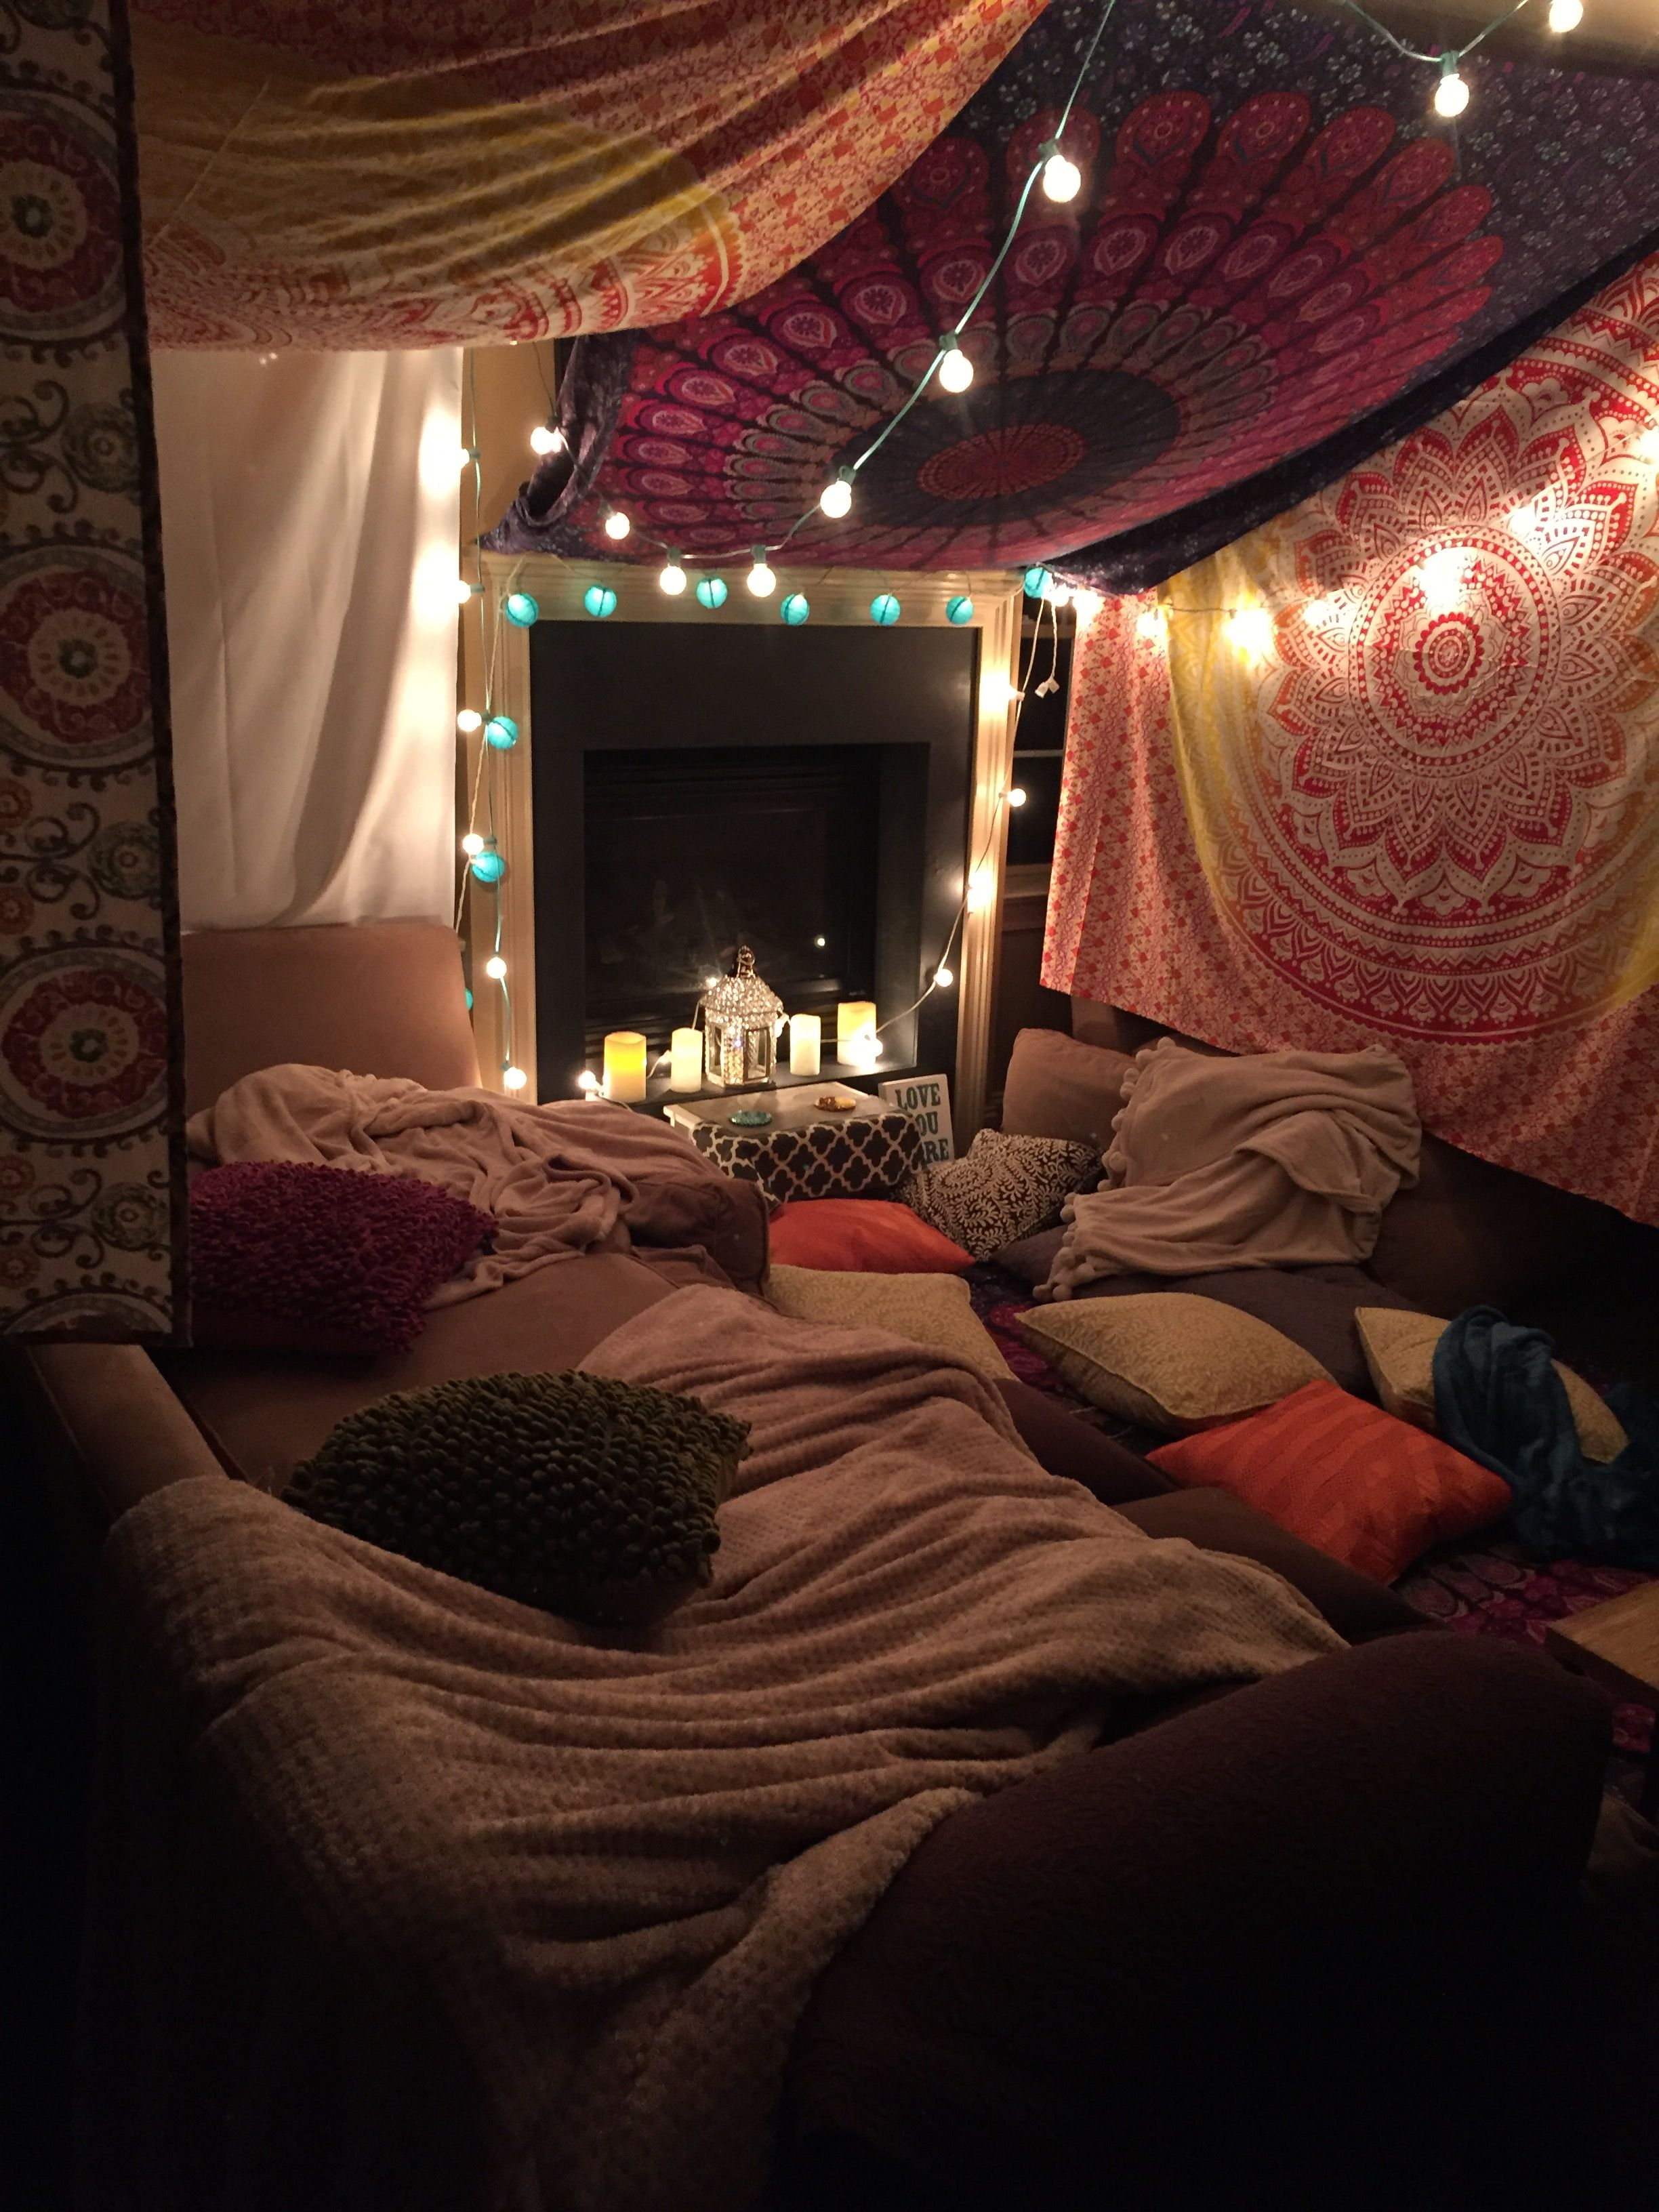 Girls Night In Chill Room Aesthetic Bedroom Sleepover Room